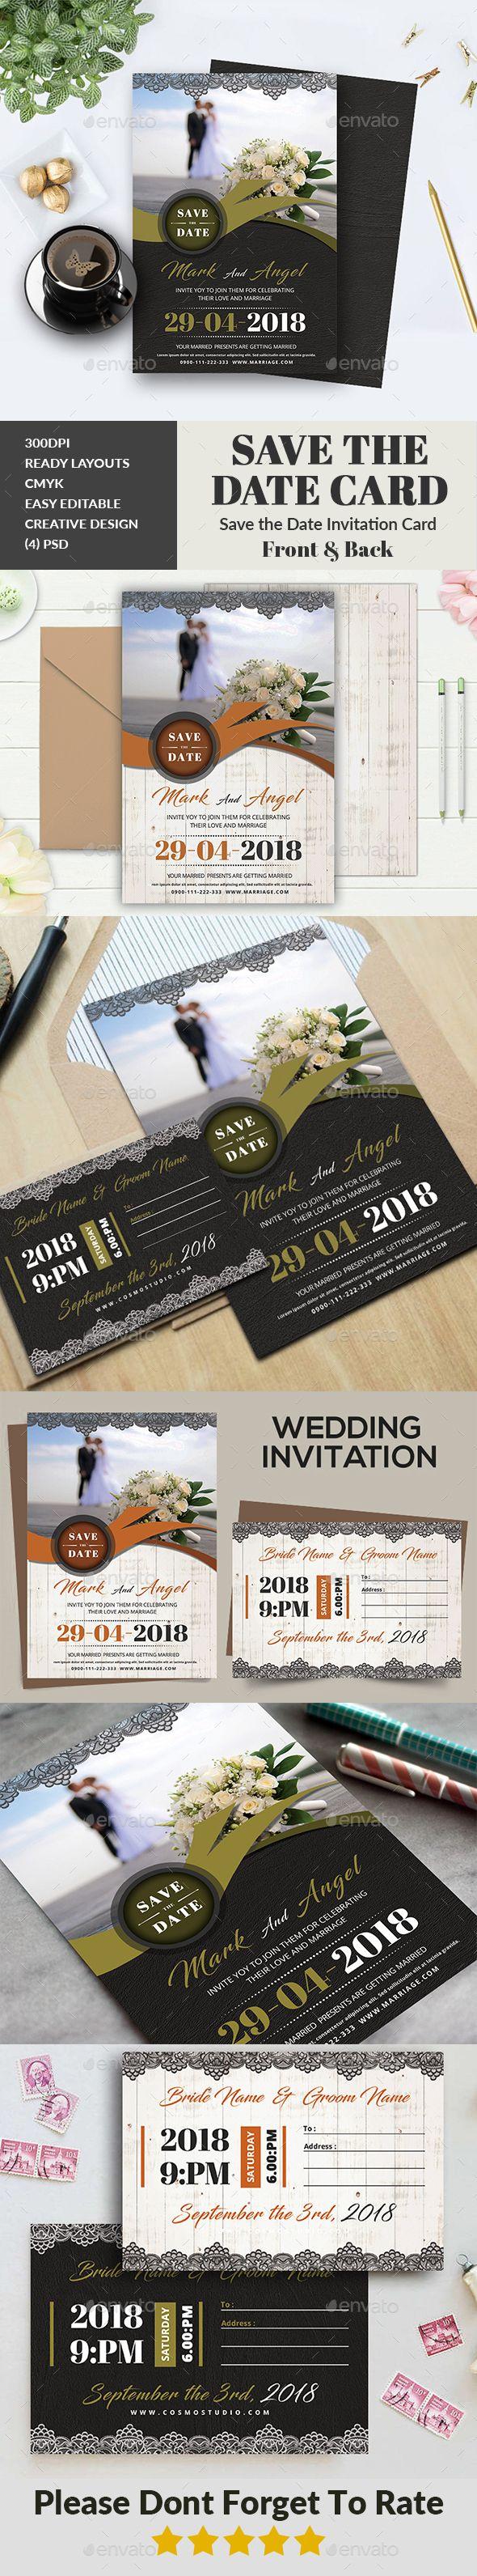 wedding invitation design psd%0A best resignation letter sample